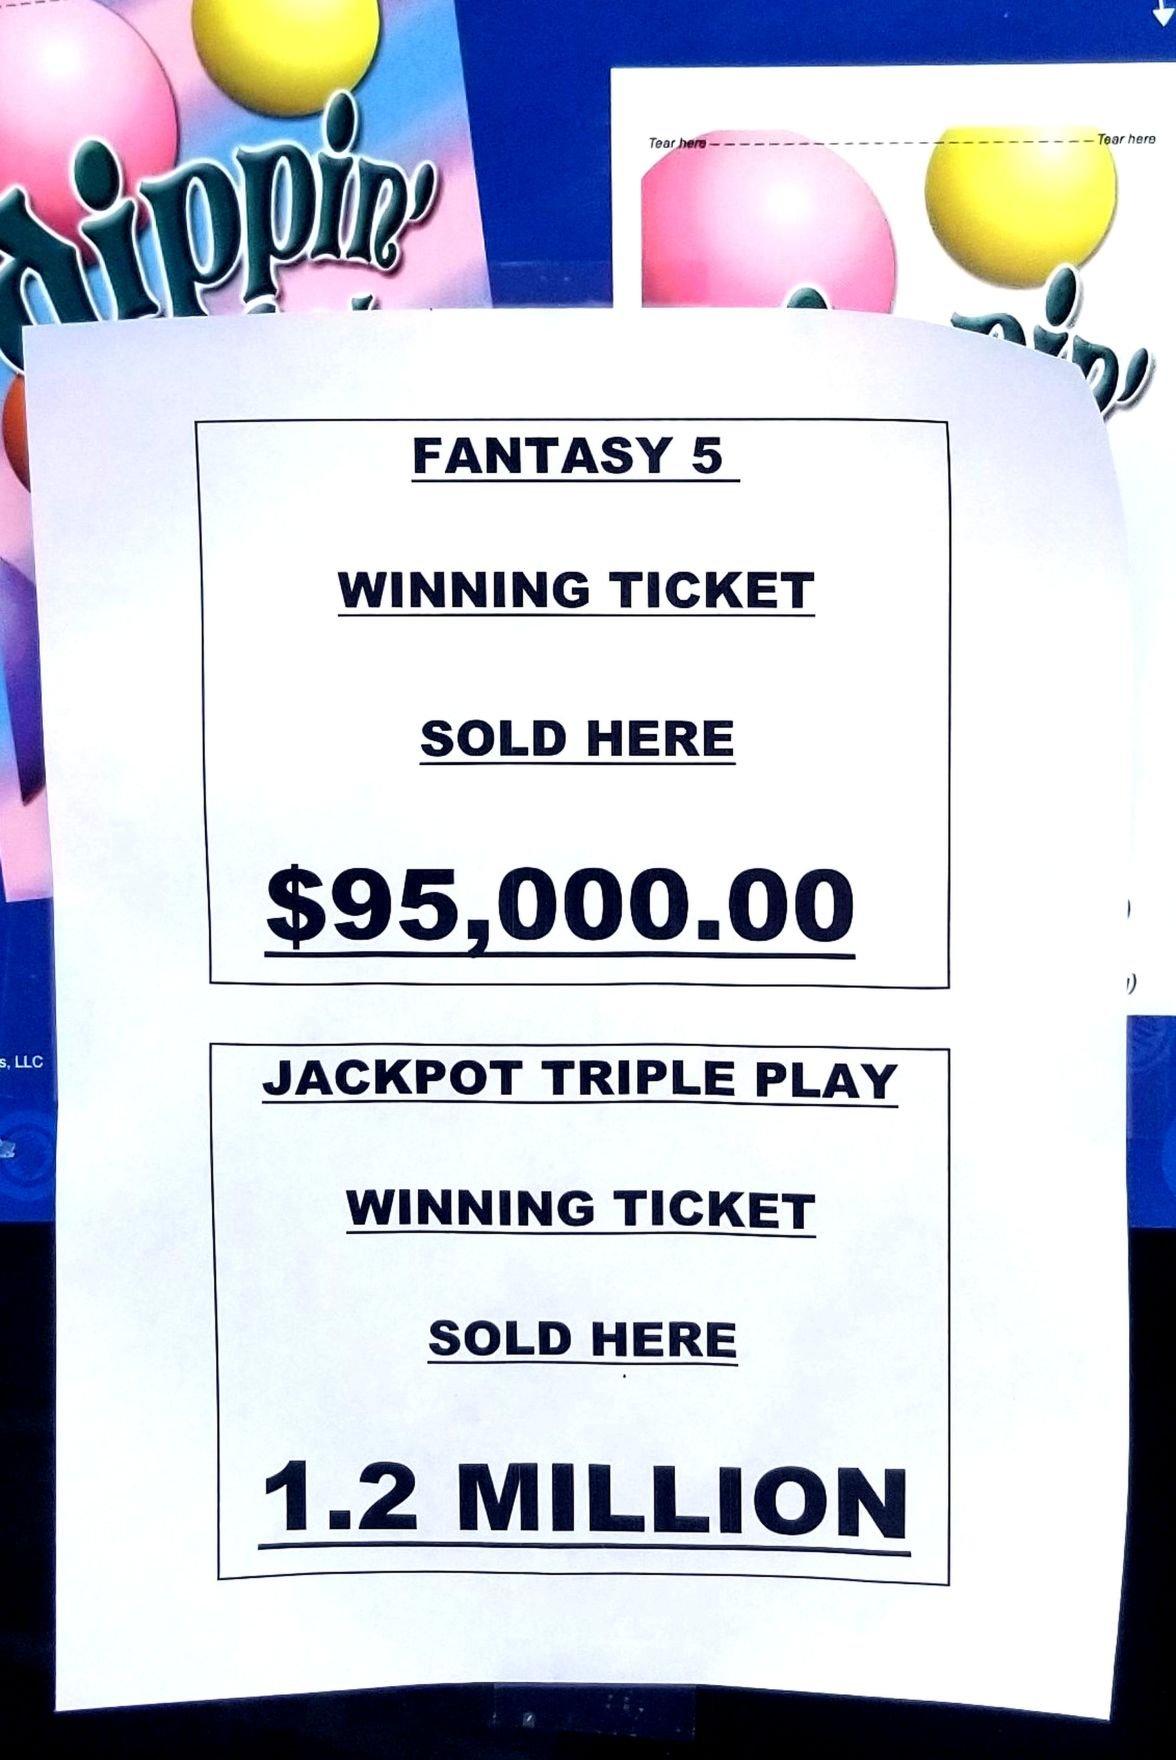 Fl lottery jackpot triple play